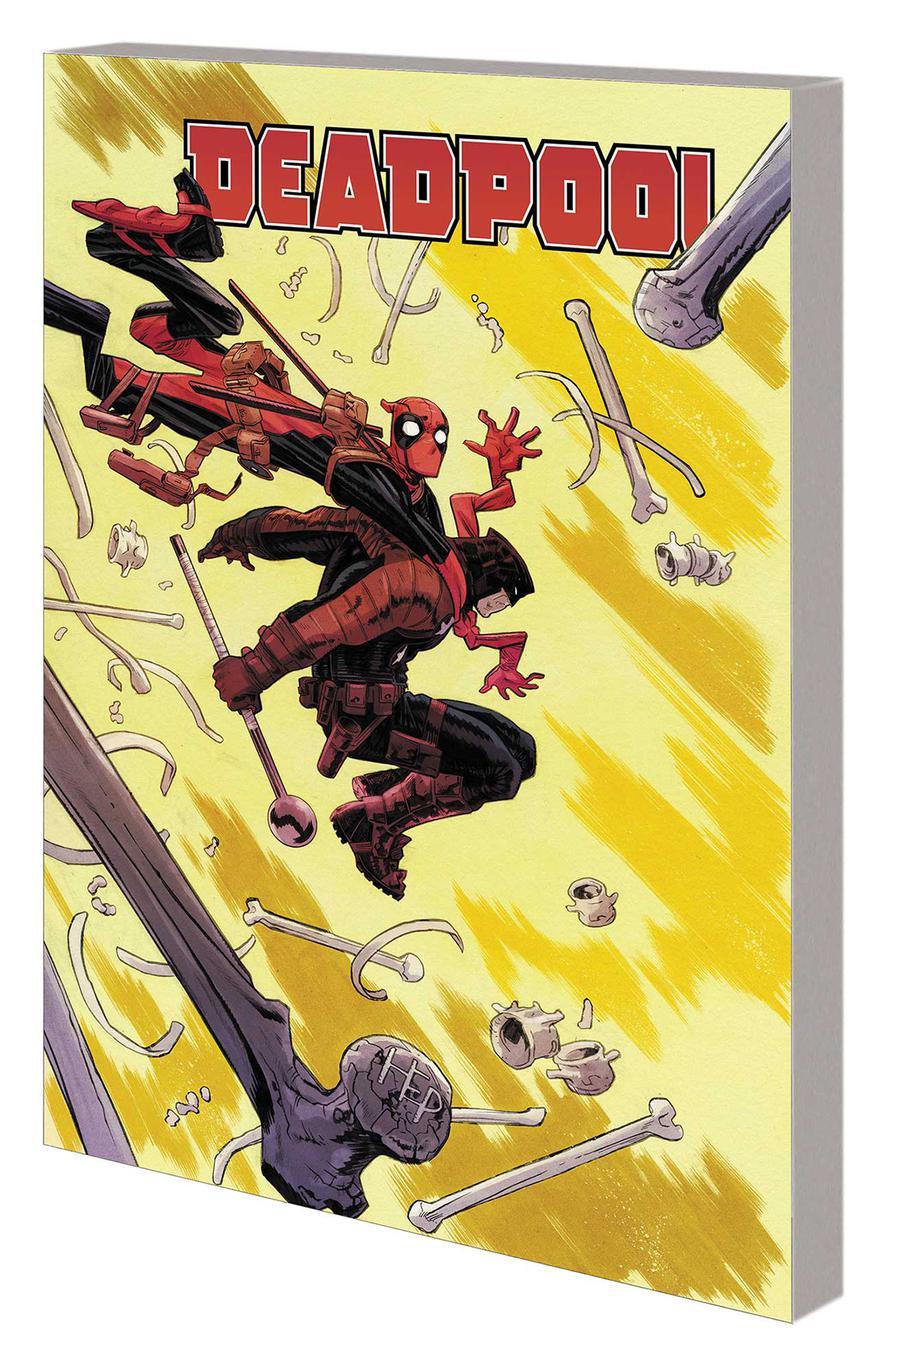 Deadpool By Skottie Young Vol 2 TP